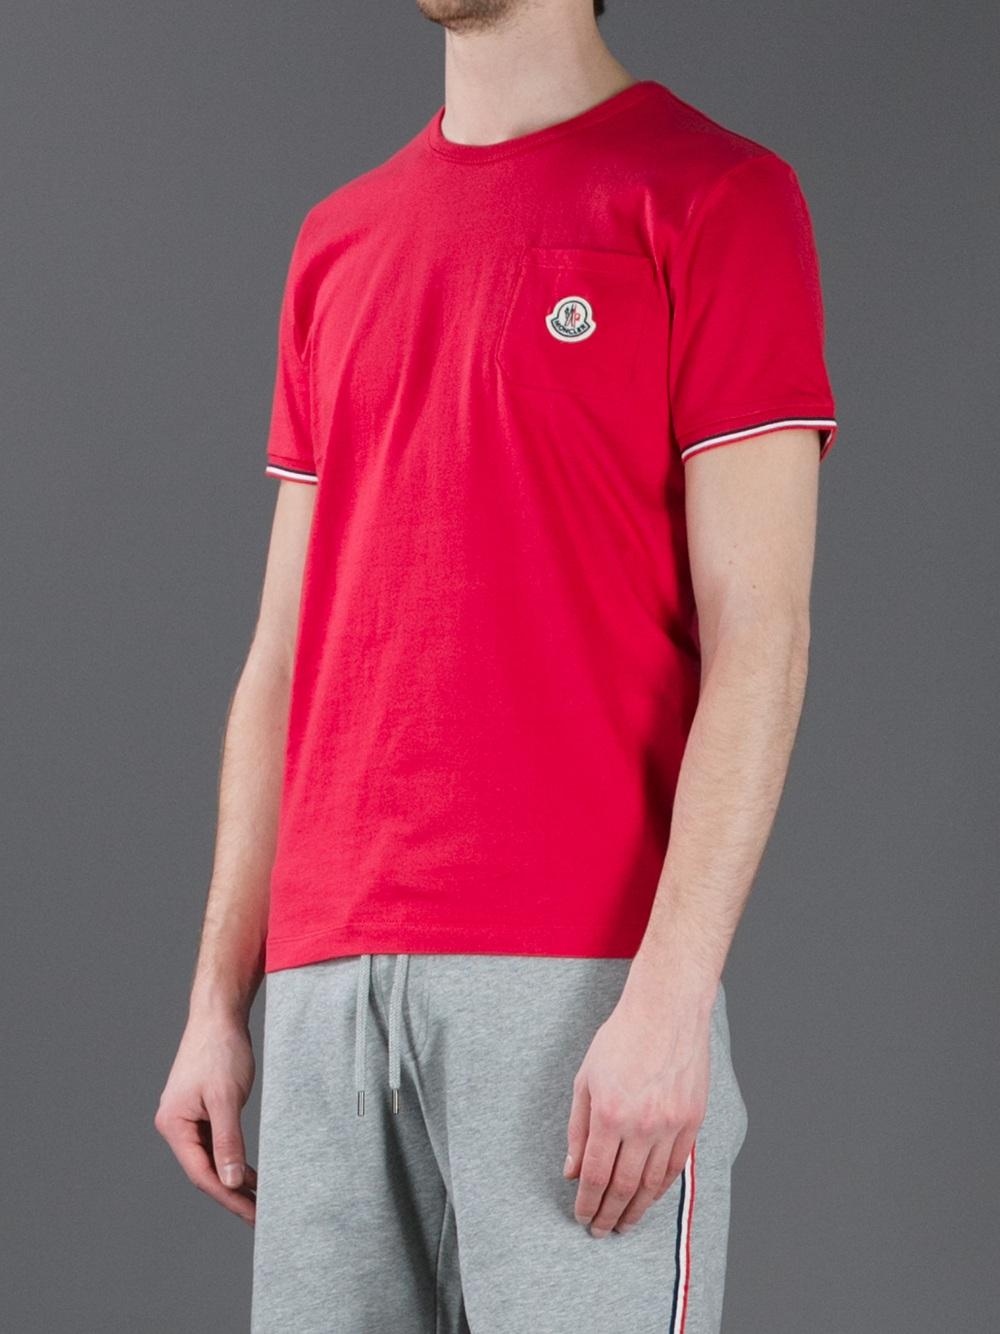 moncler red t shirt